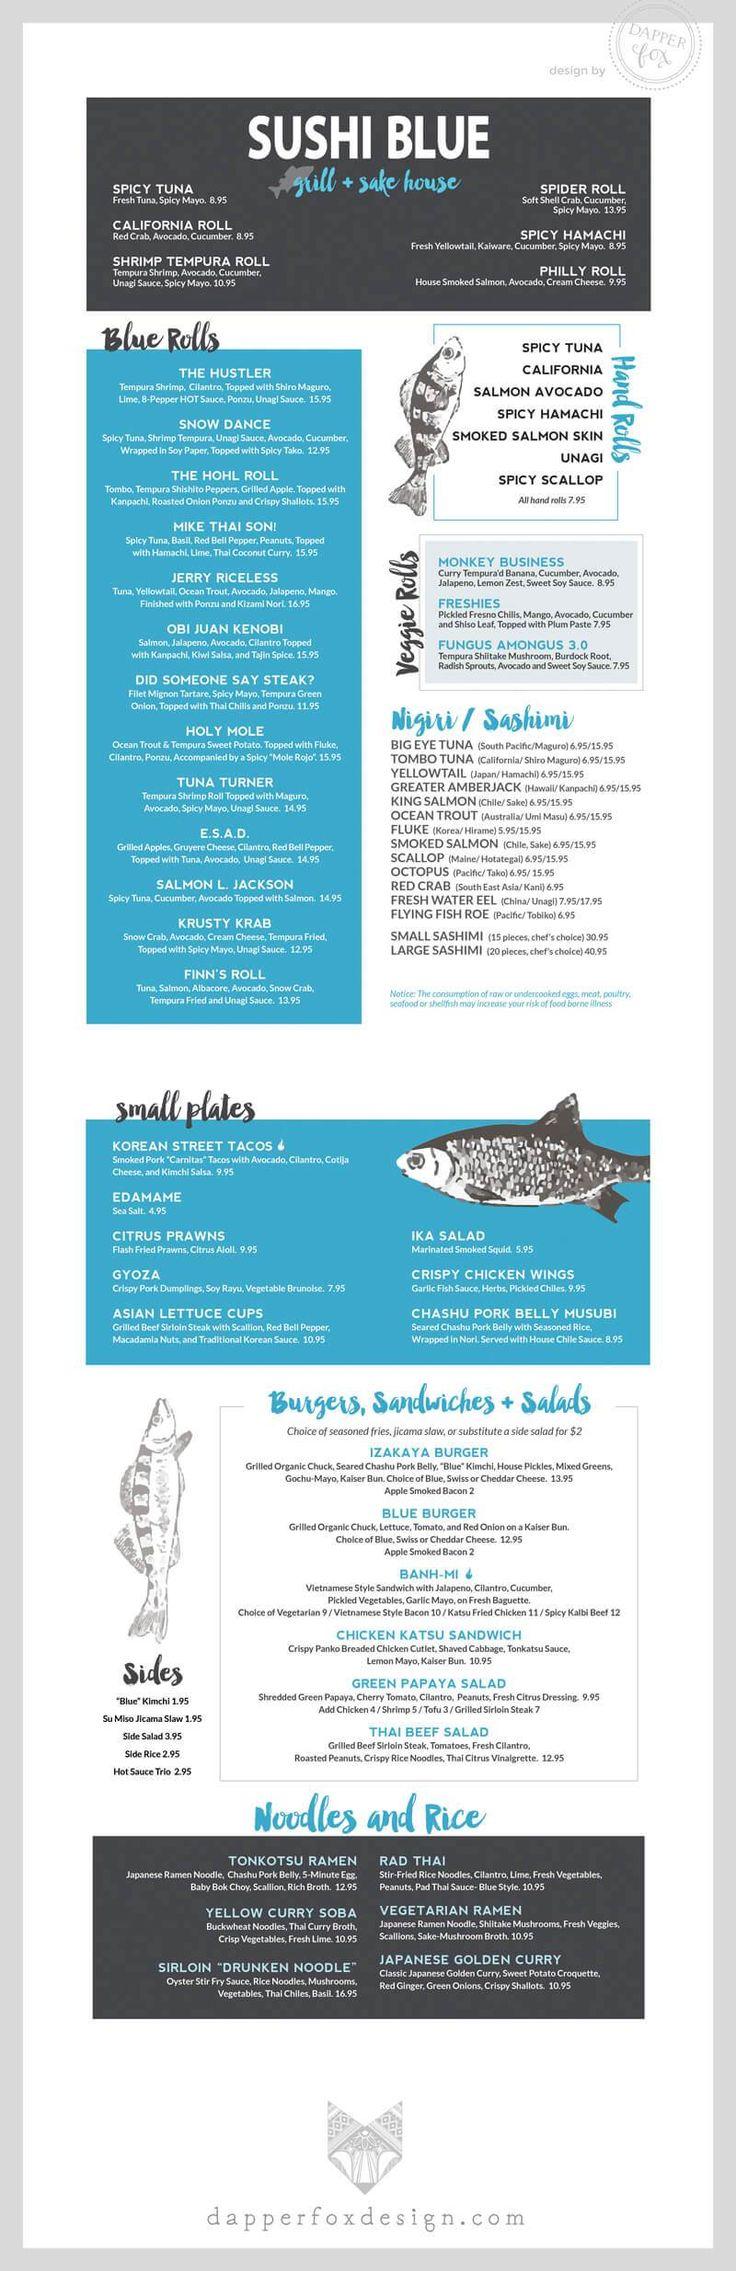 Dapper Fox Design // Branding - Website Design - Logos // Dinner and Lunch Restaurant Menu Design for Sushi Blue in Park City    //   Website Design - Branding - Logo Design - Brand - Entrepreneur Blog and Resource